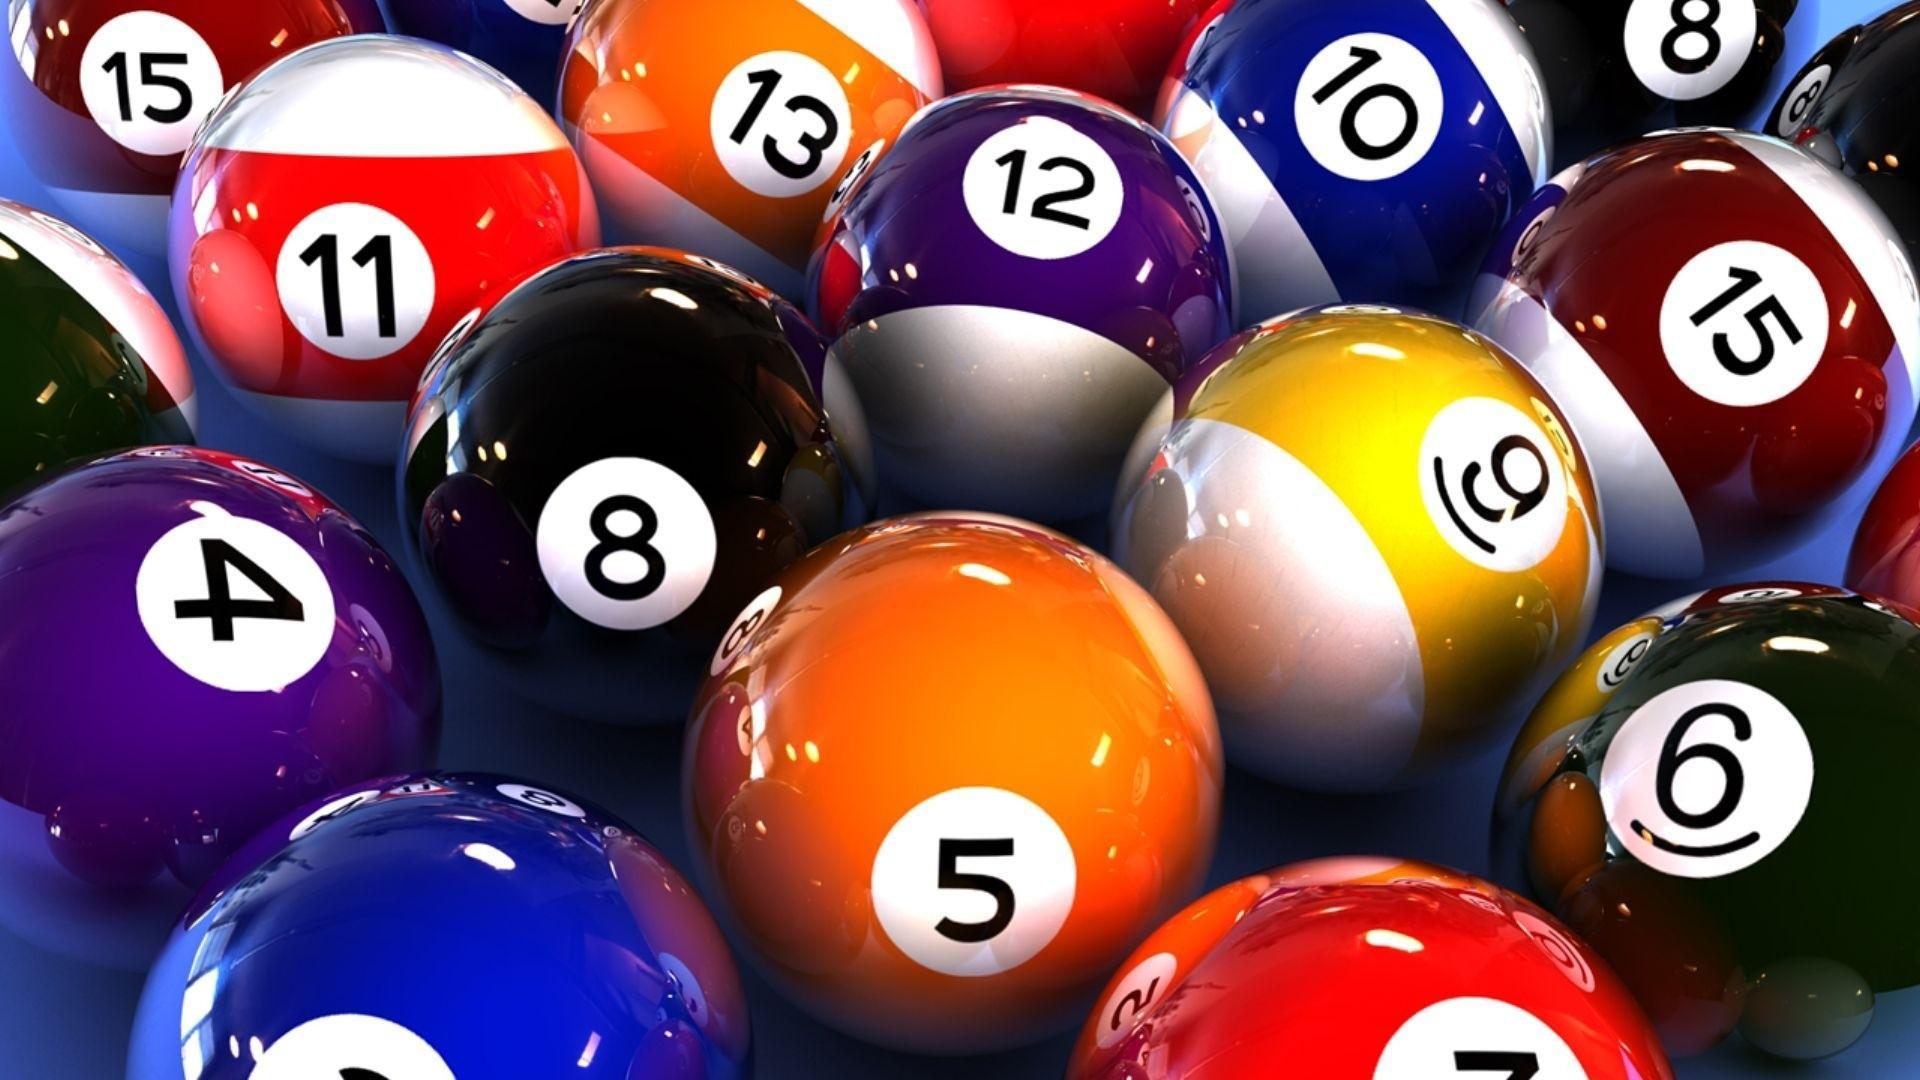 Abstract-balls-billiards-games-multicolor-1920x1080-balls-billiards-games-multicolor-via-www-wallpaper-wp3602164